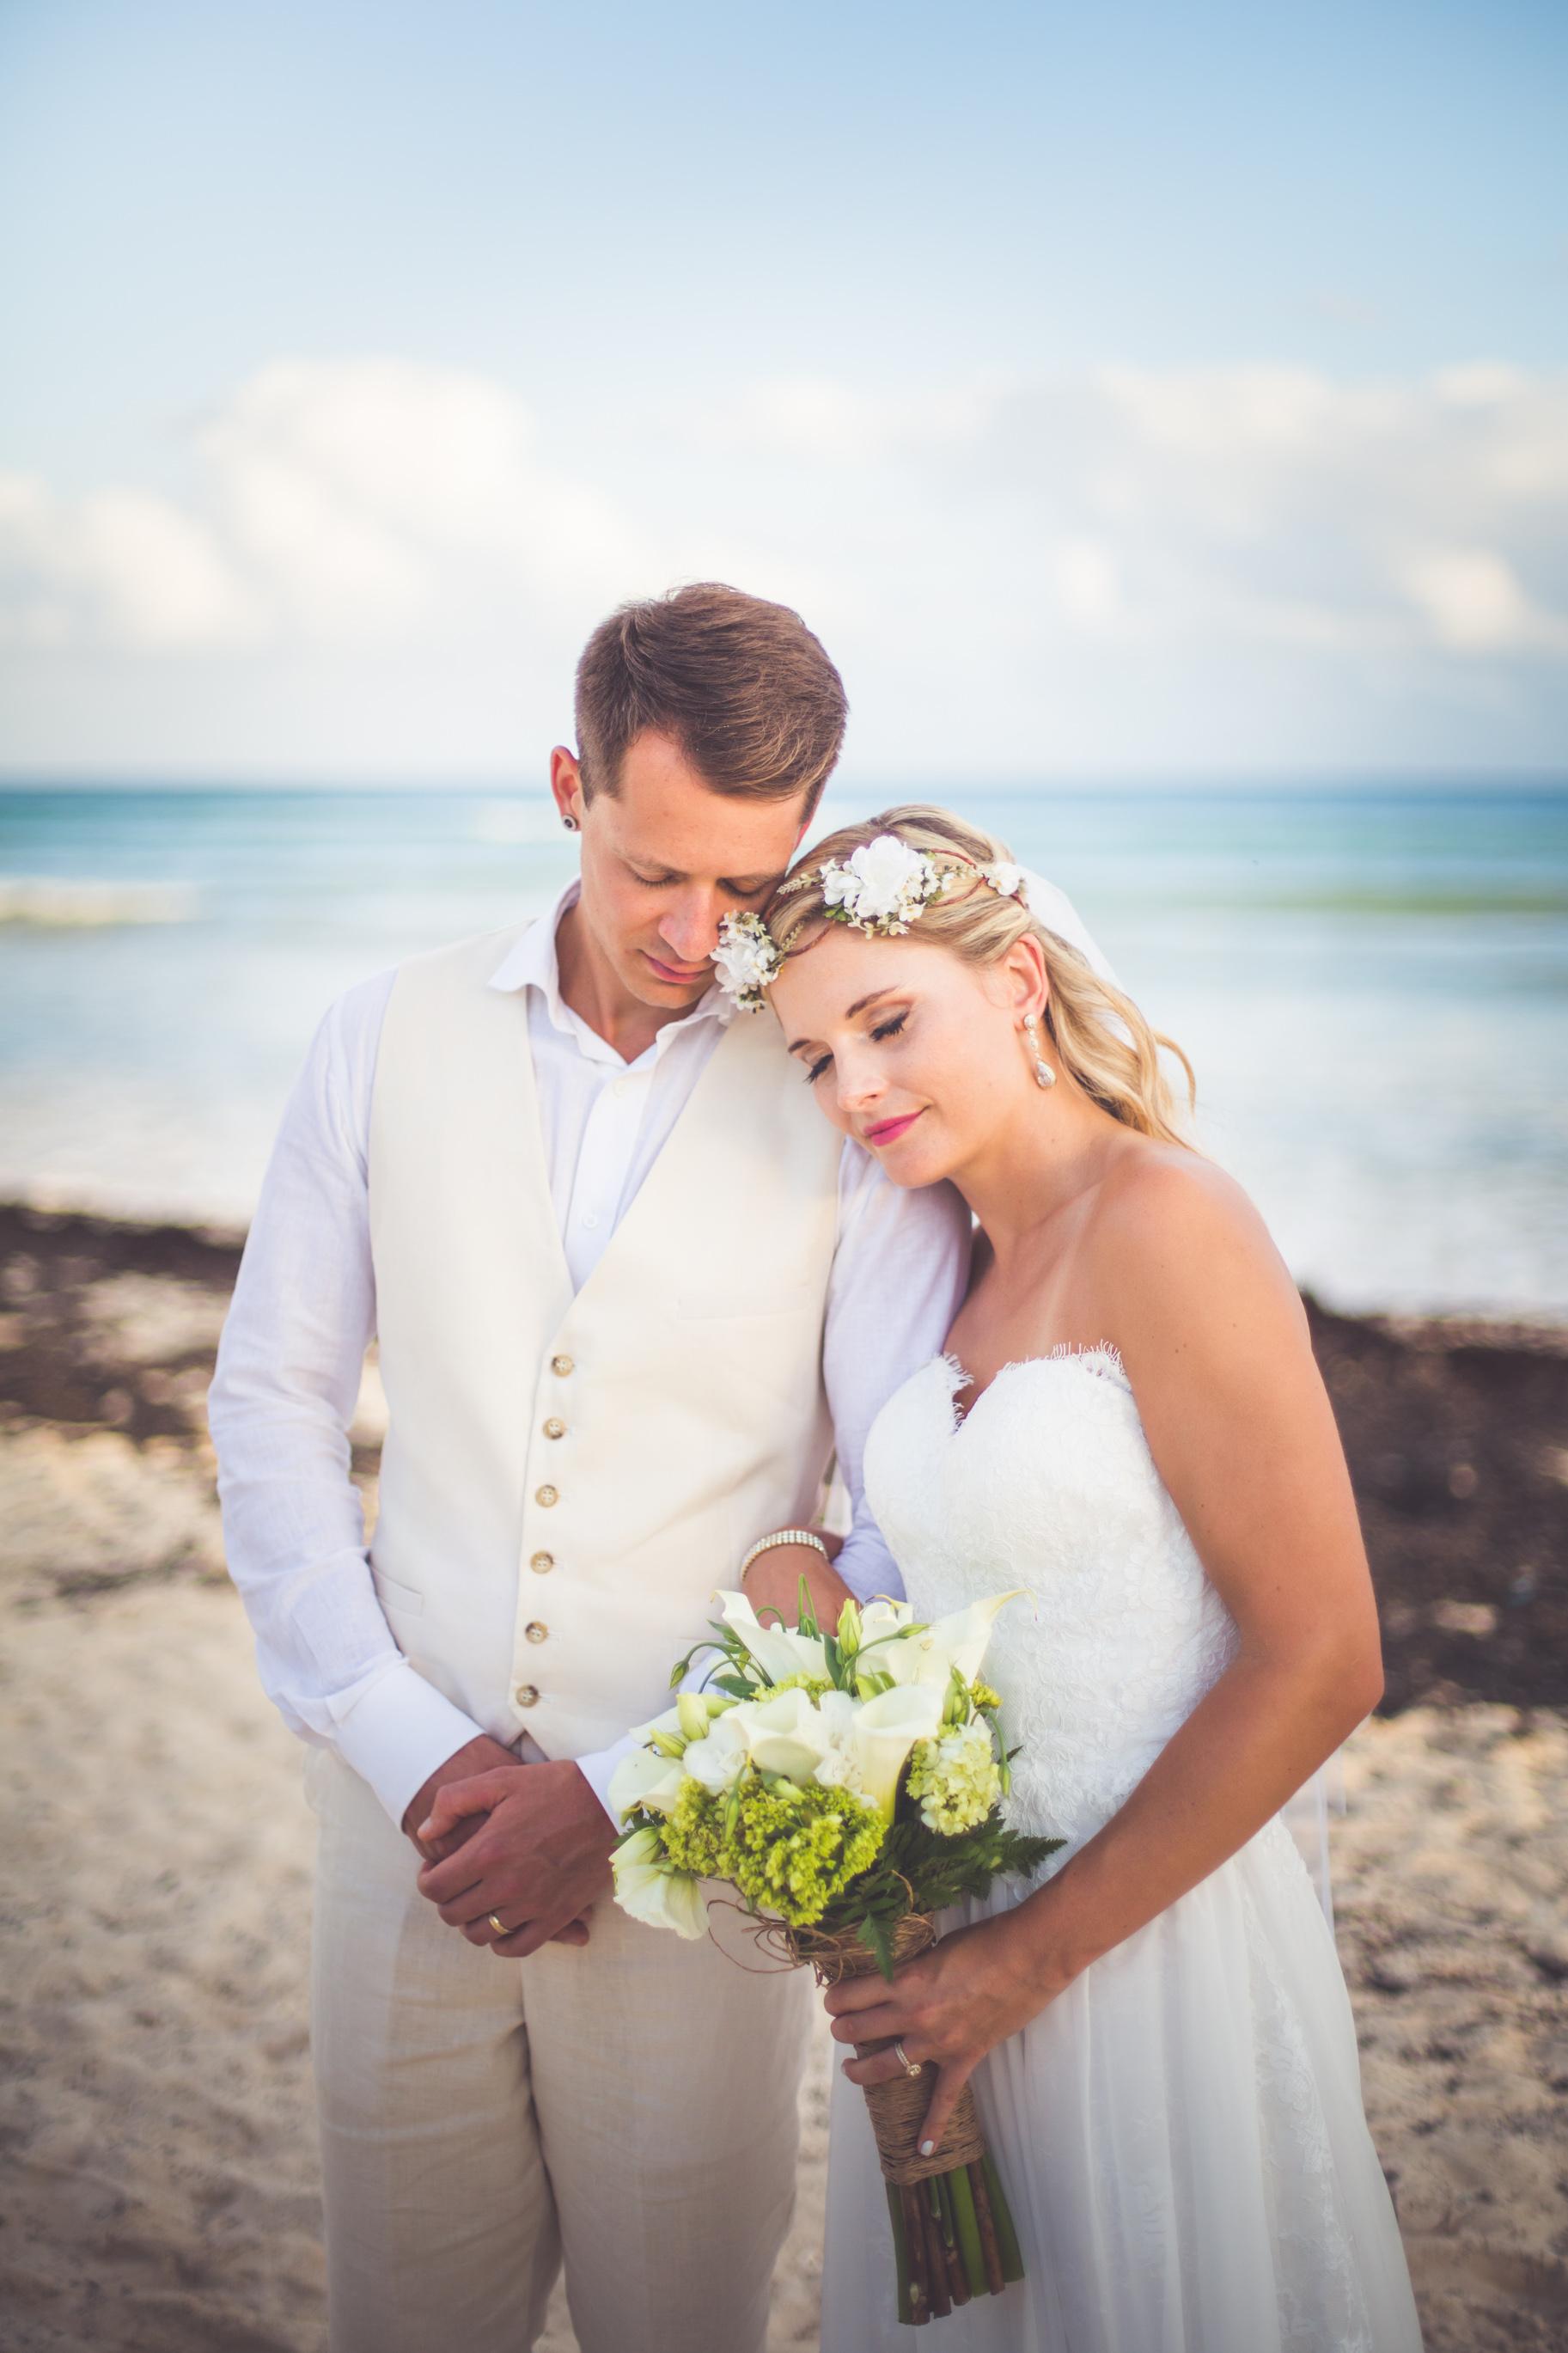 CARMEN-PETER-WEDDING-2016-137.jpg